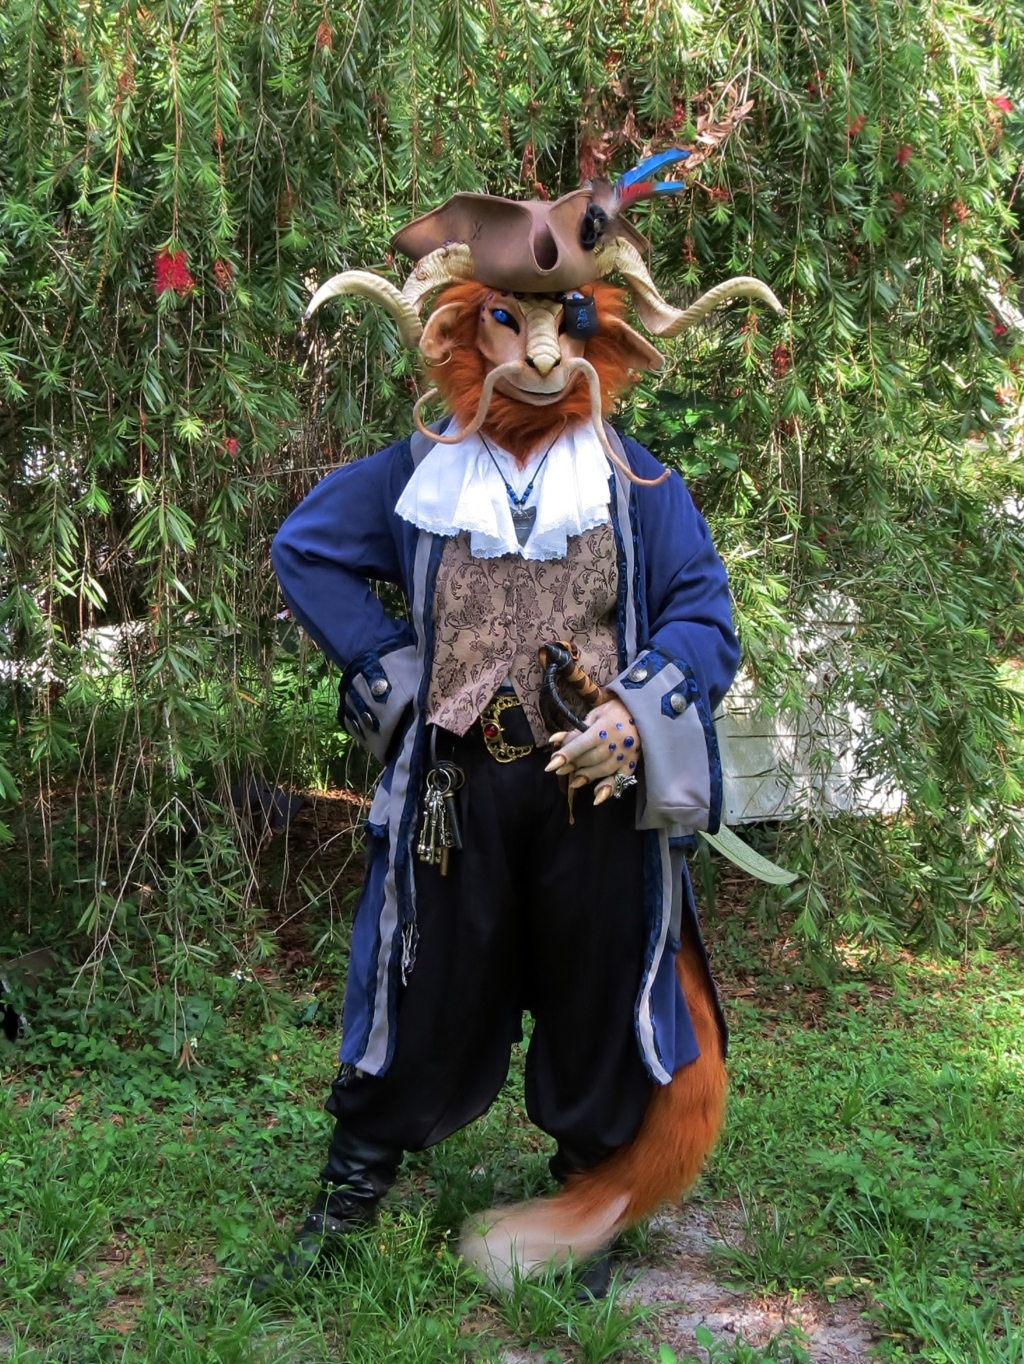 Pirate Costume Test